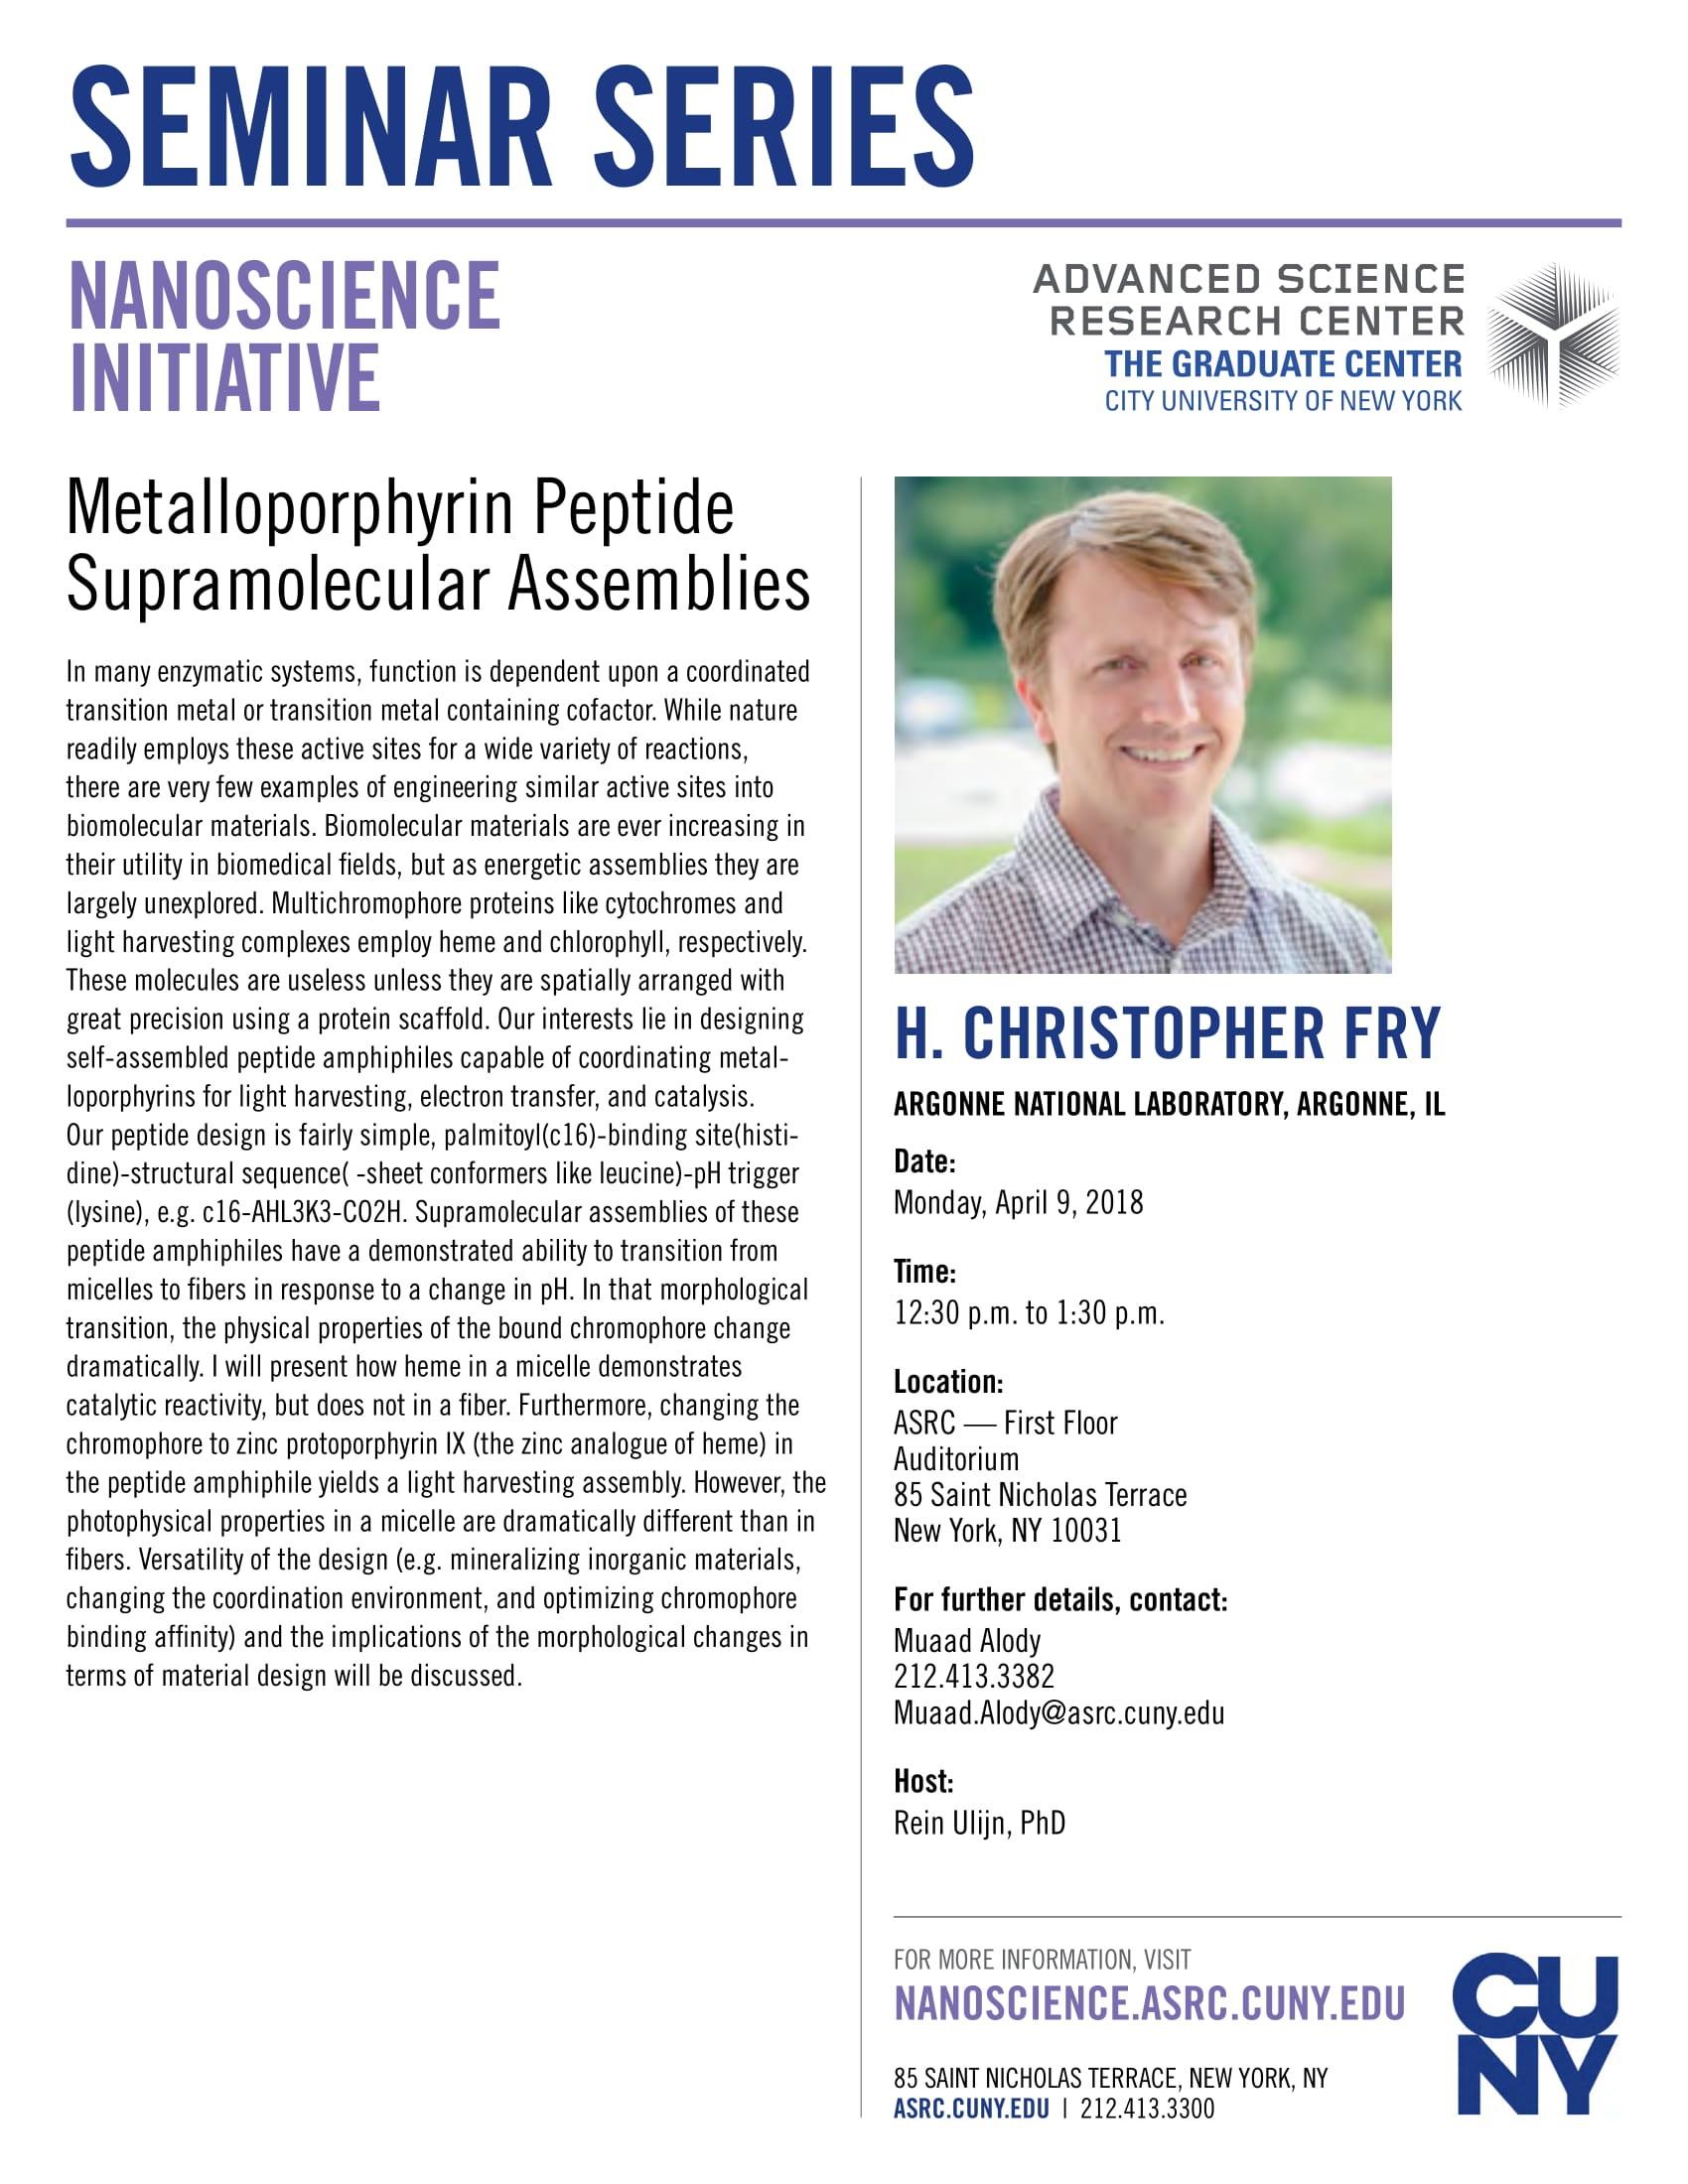 Salzberg Chemistry Seminar - H. Christopher Fry